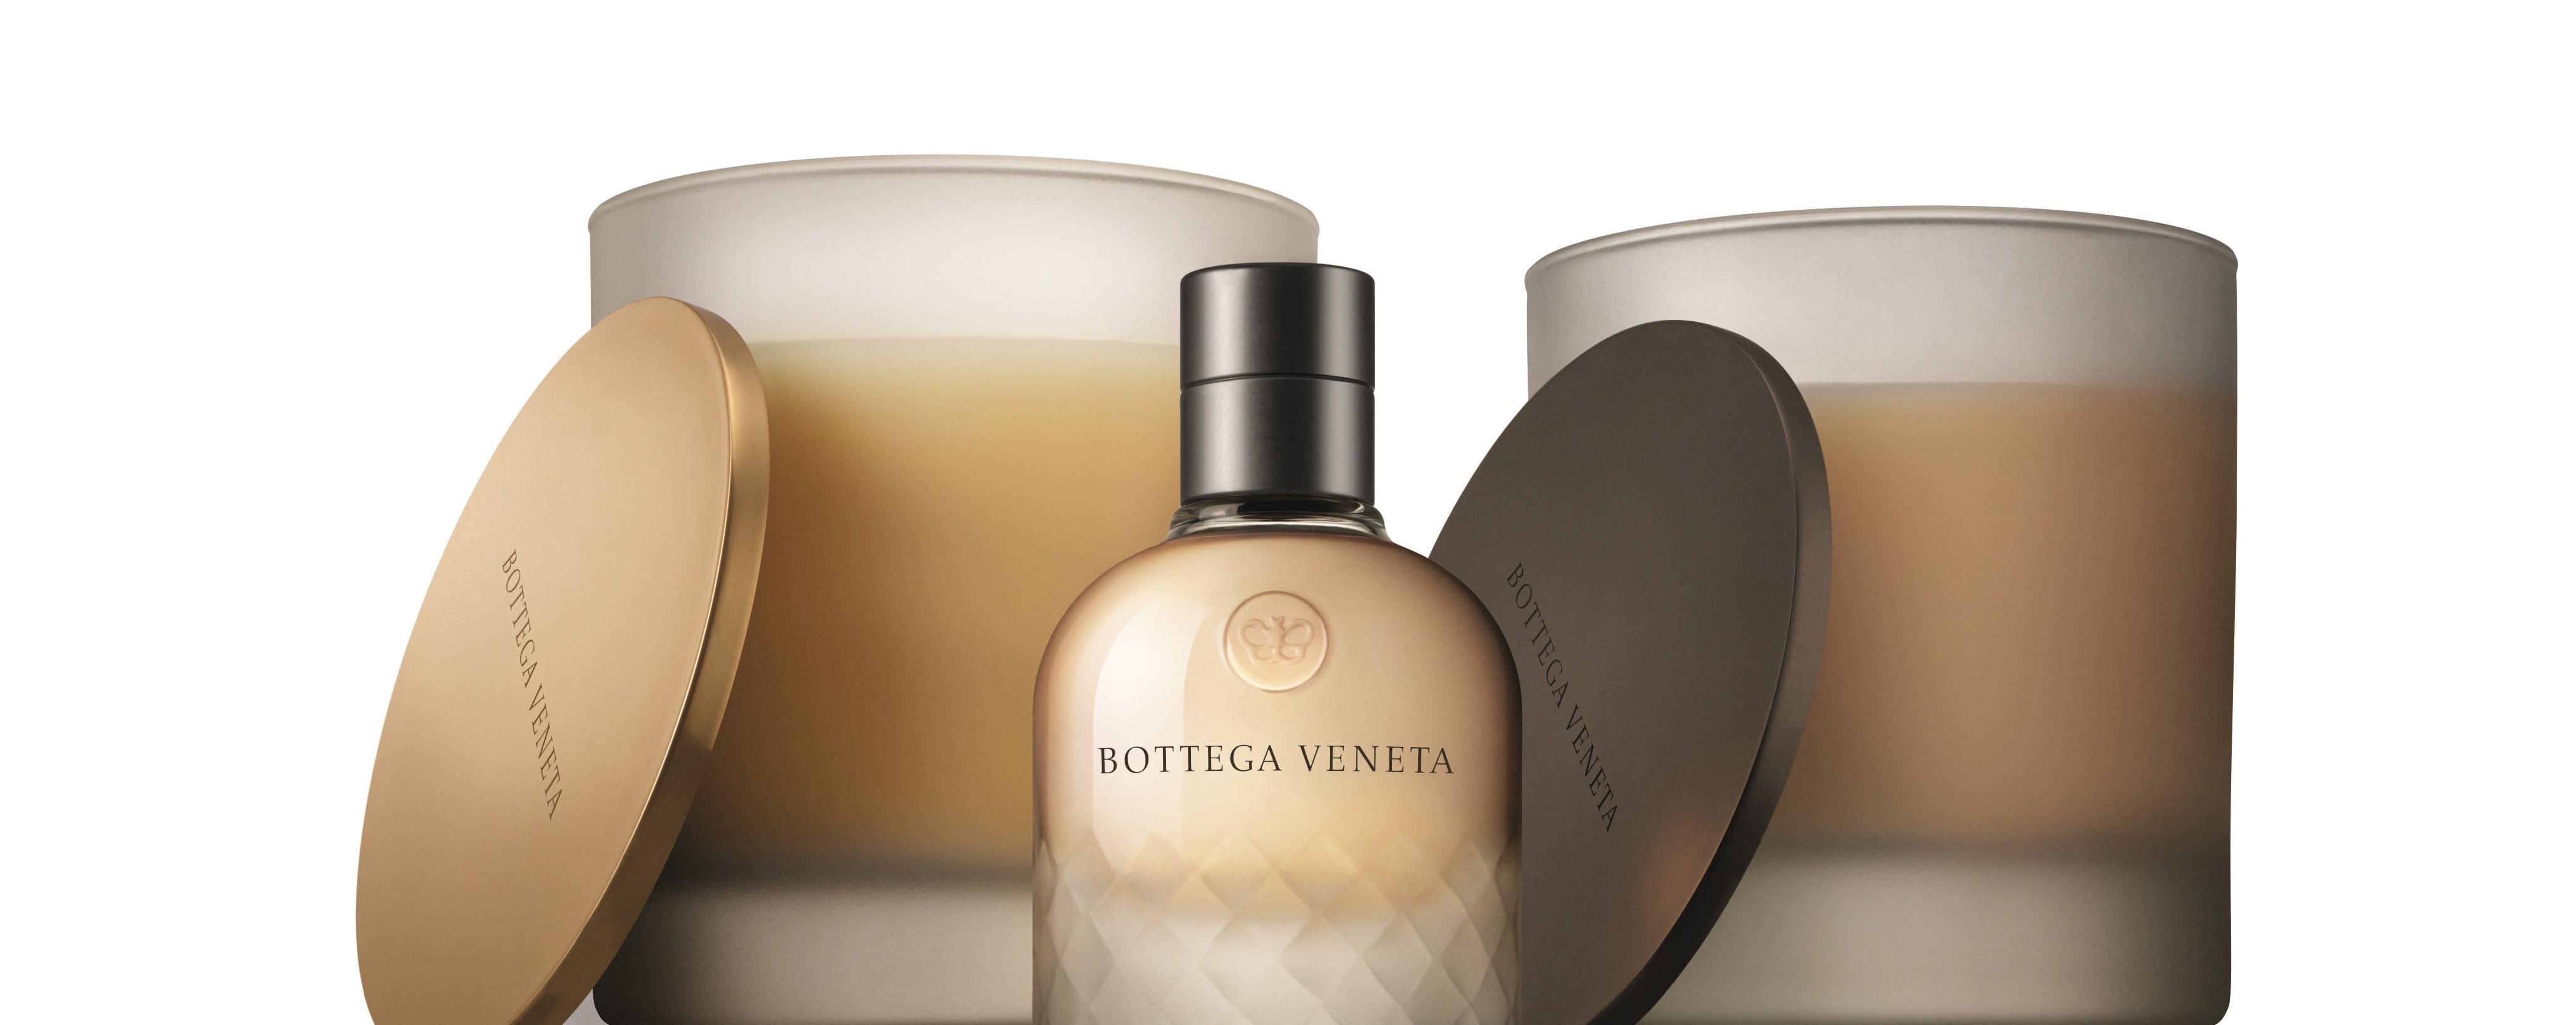 Bottega-Veneta-scented-candles